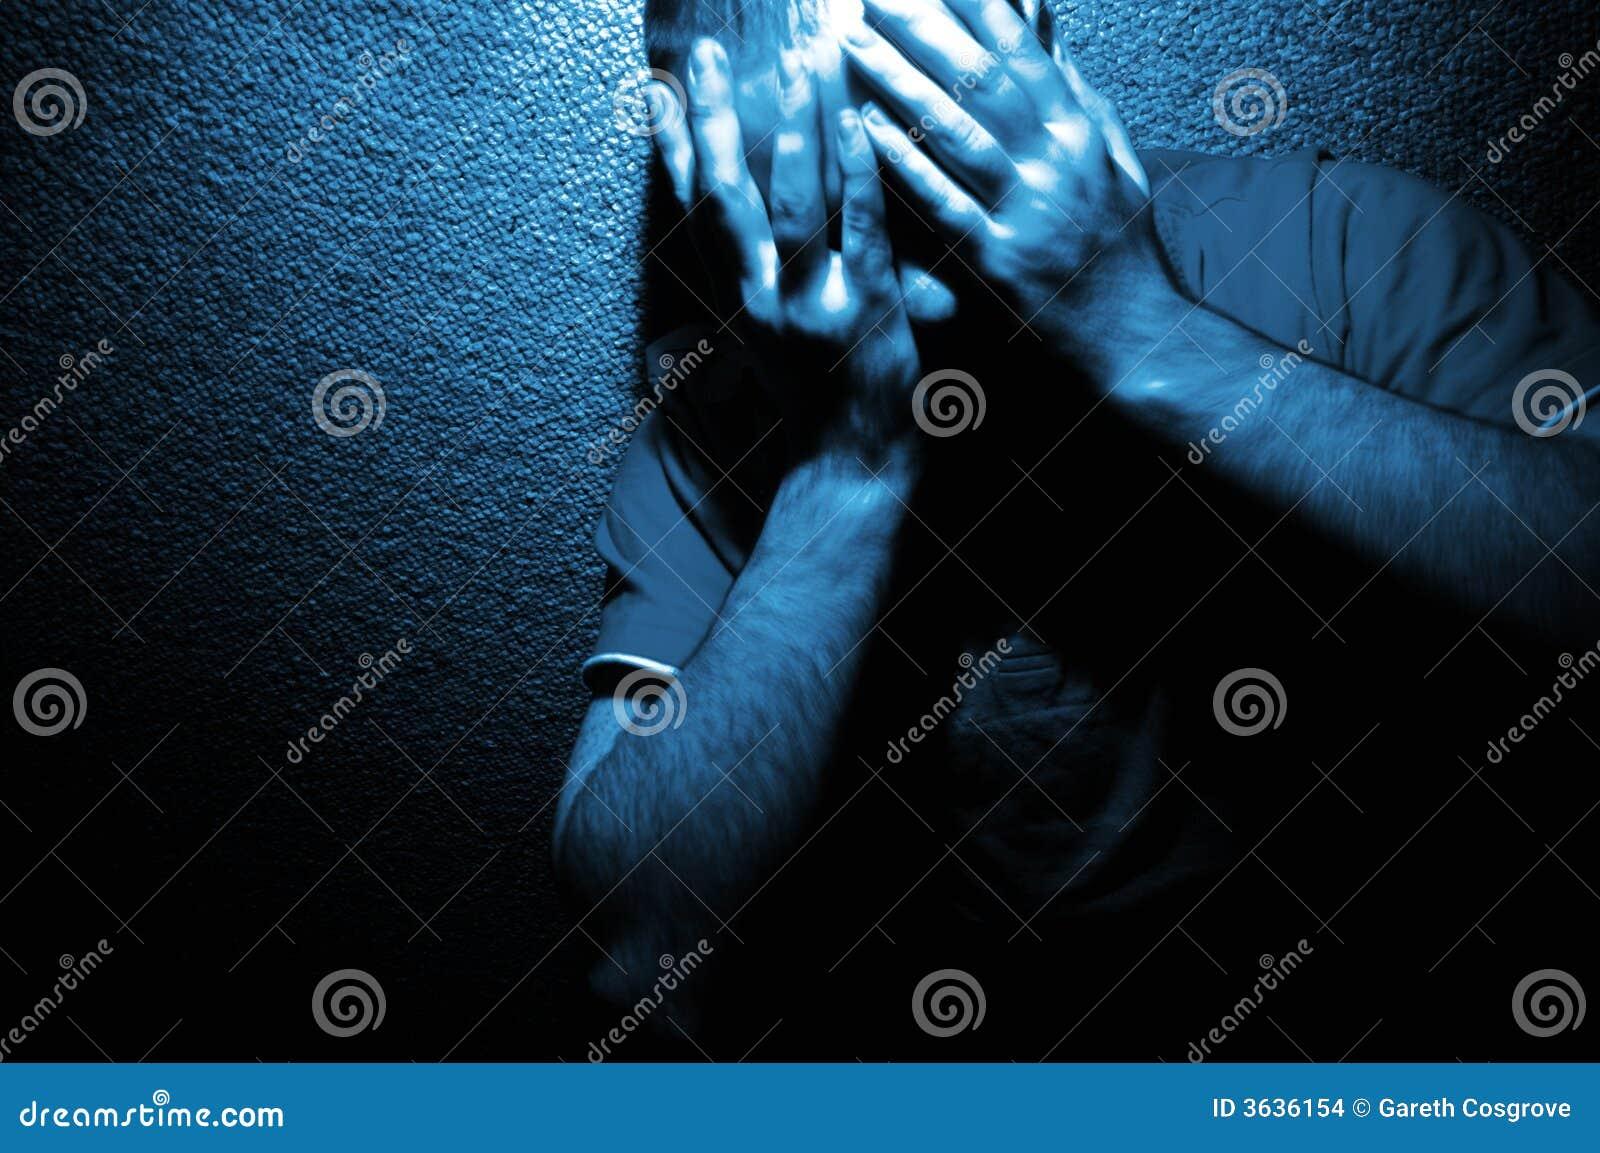 Portrait of Anguish in Blue